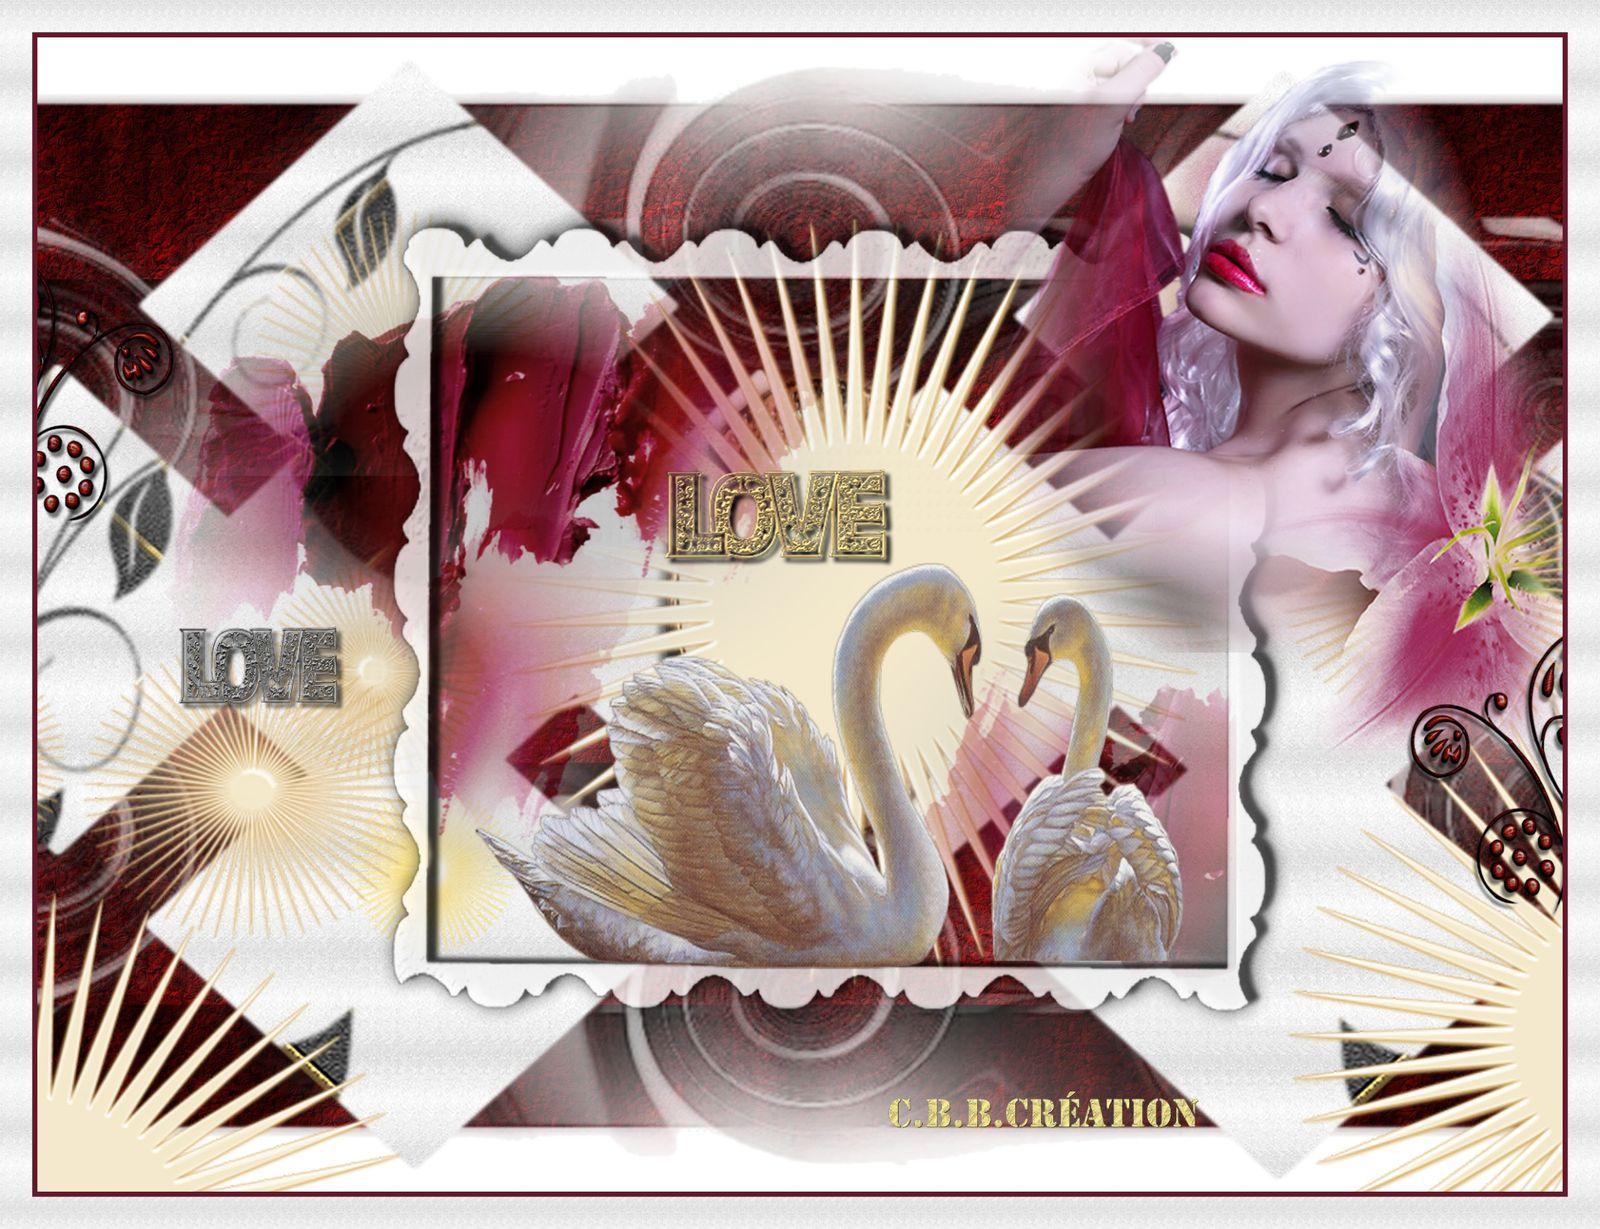 http://idata.over-blog.com/3/91/86/55/175.jpg